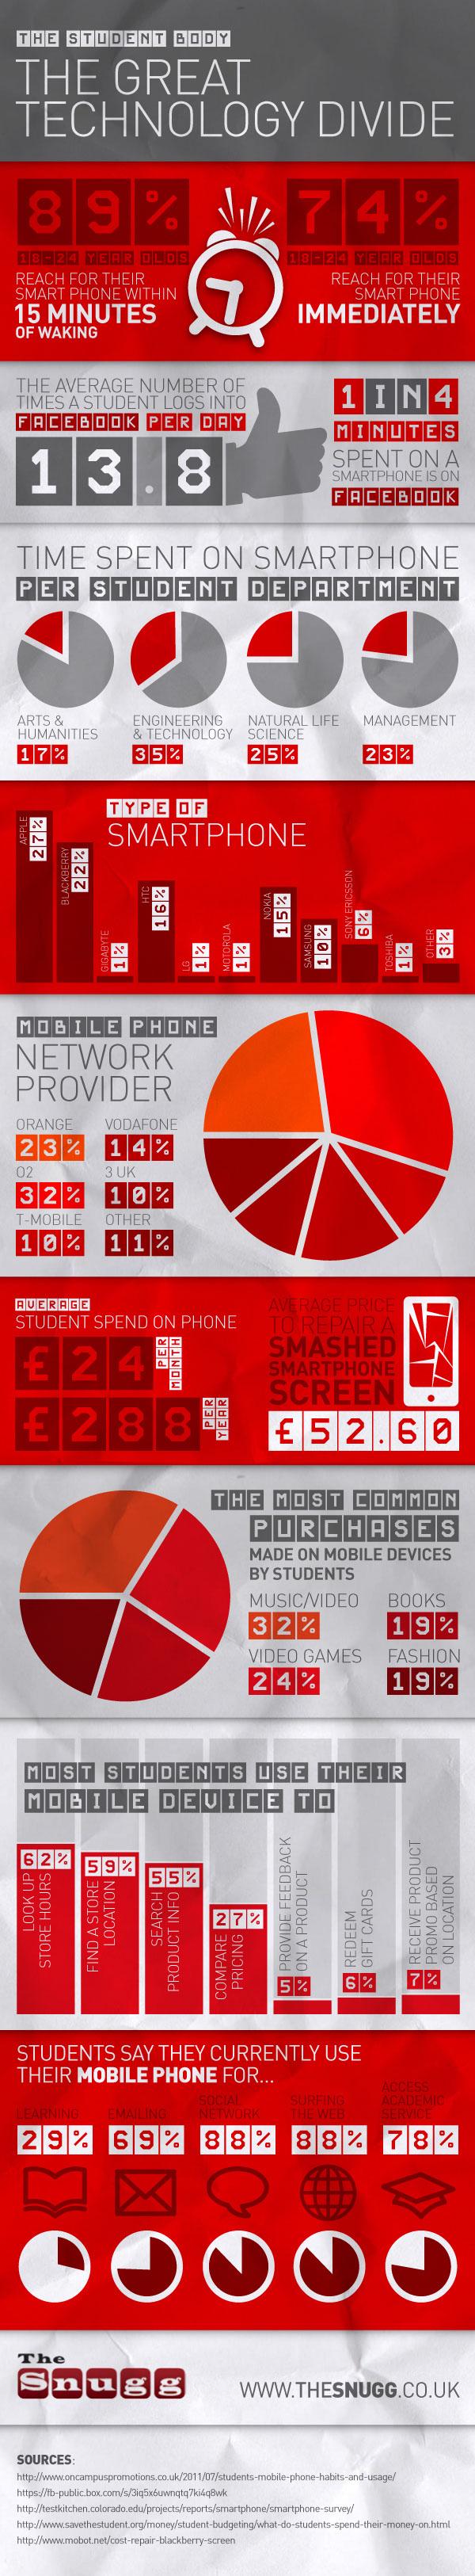 Student Smartphone Addiction-Infographic